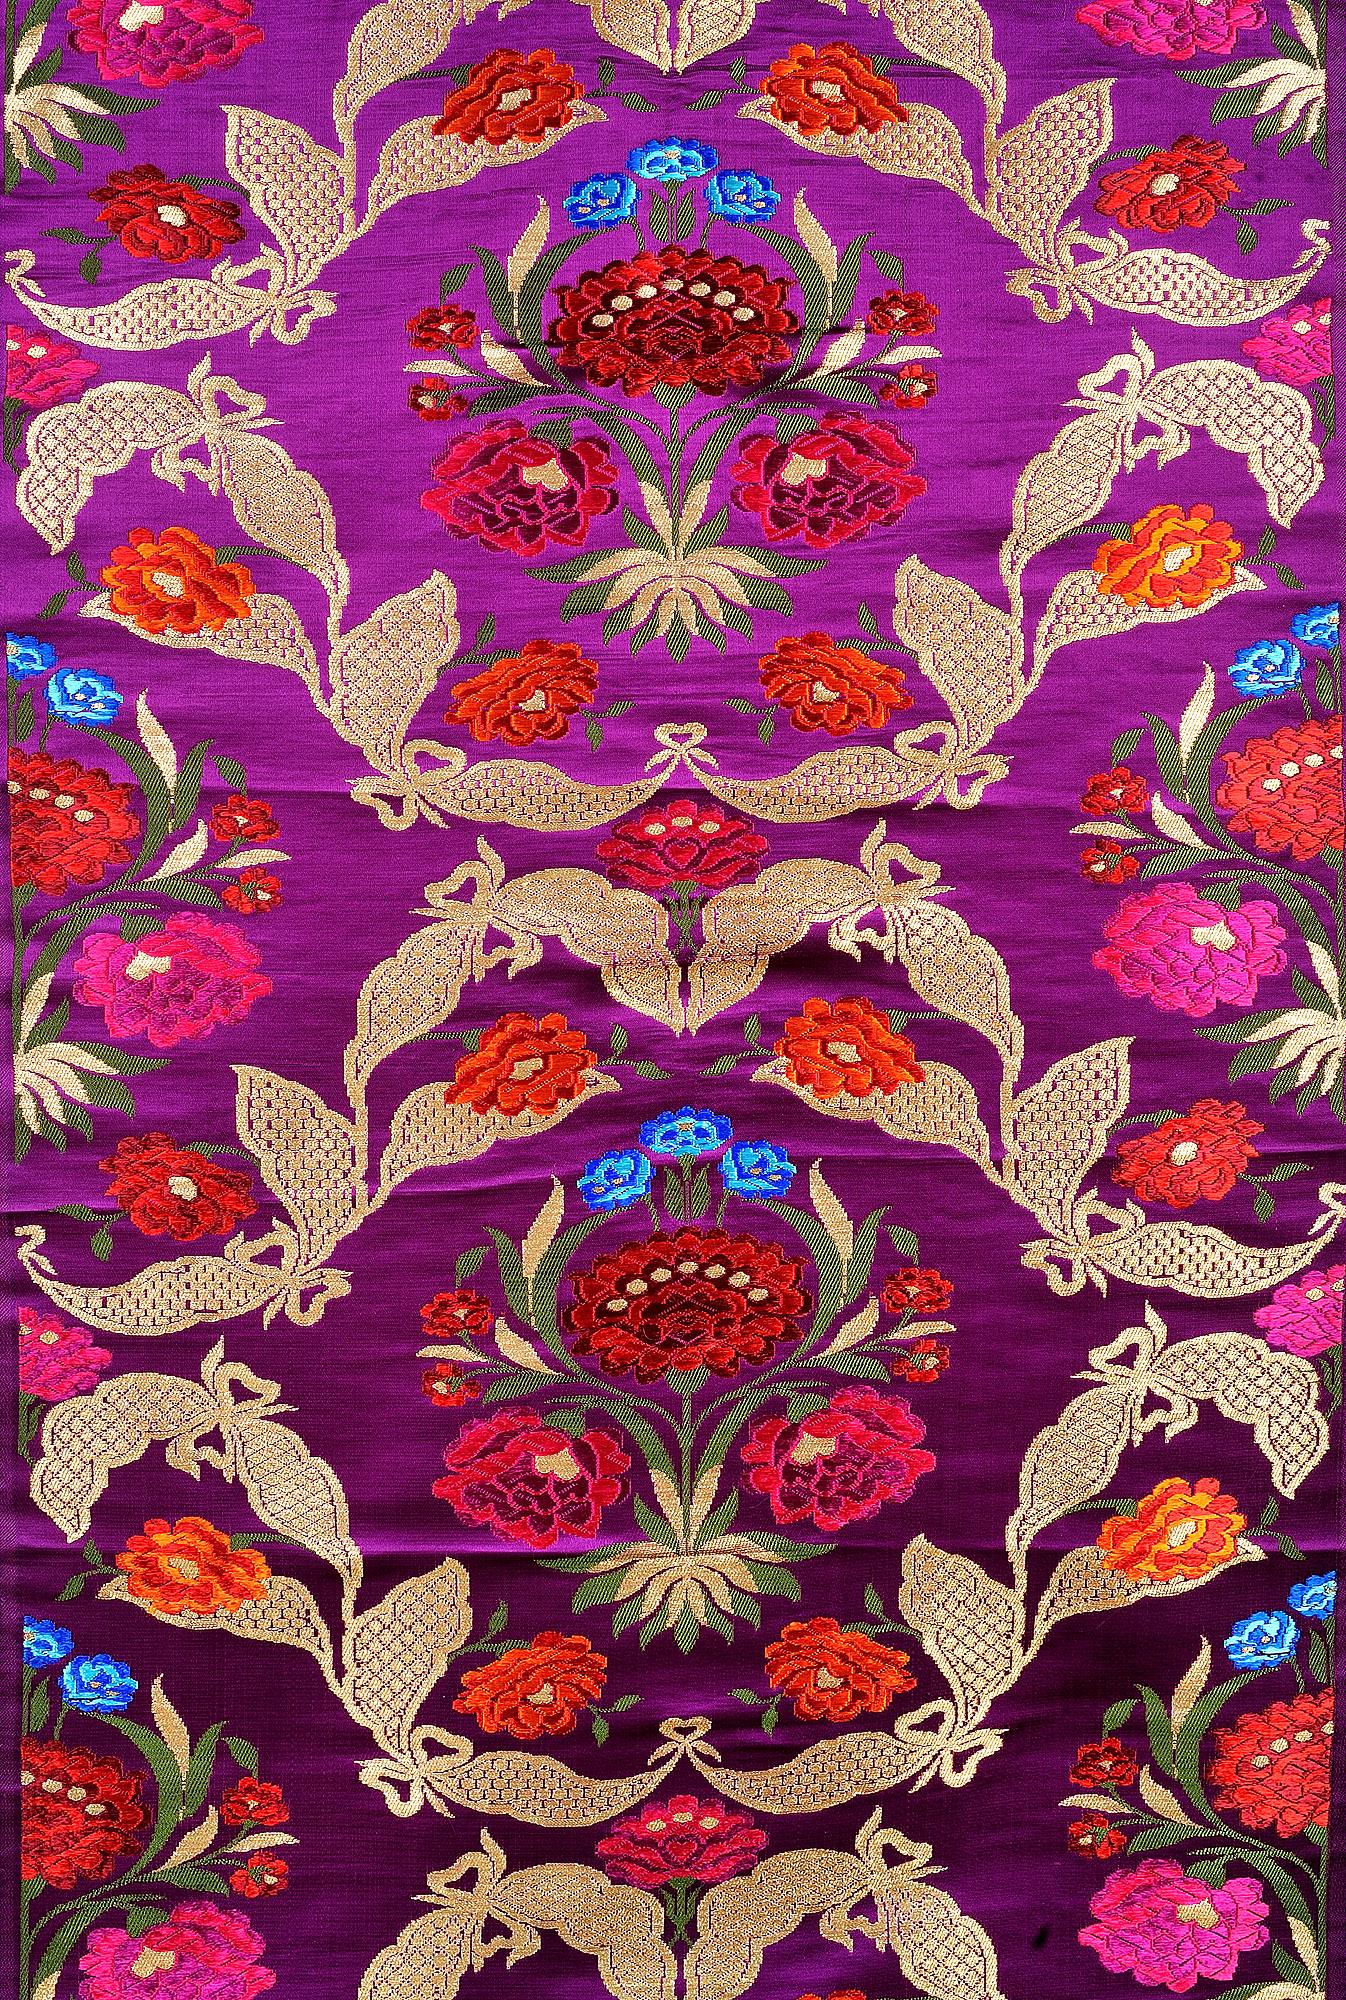 Indian fabric Wedding Dress fabric Purple Brocade Fabric by the Yard Banaras Fabric Banarasi Brocade Fabric for Lengha